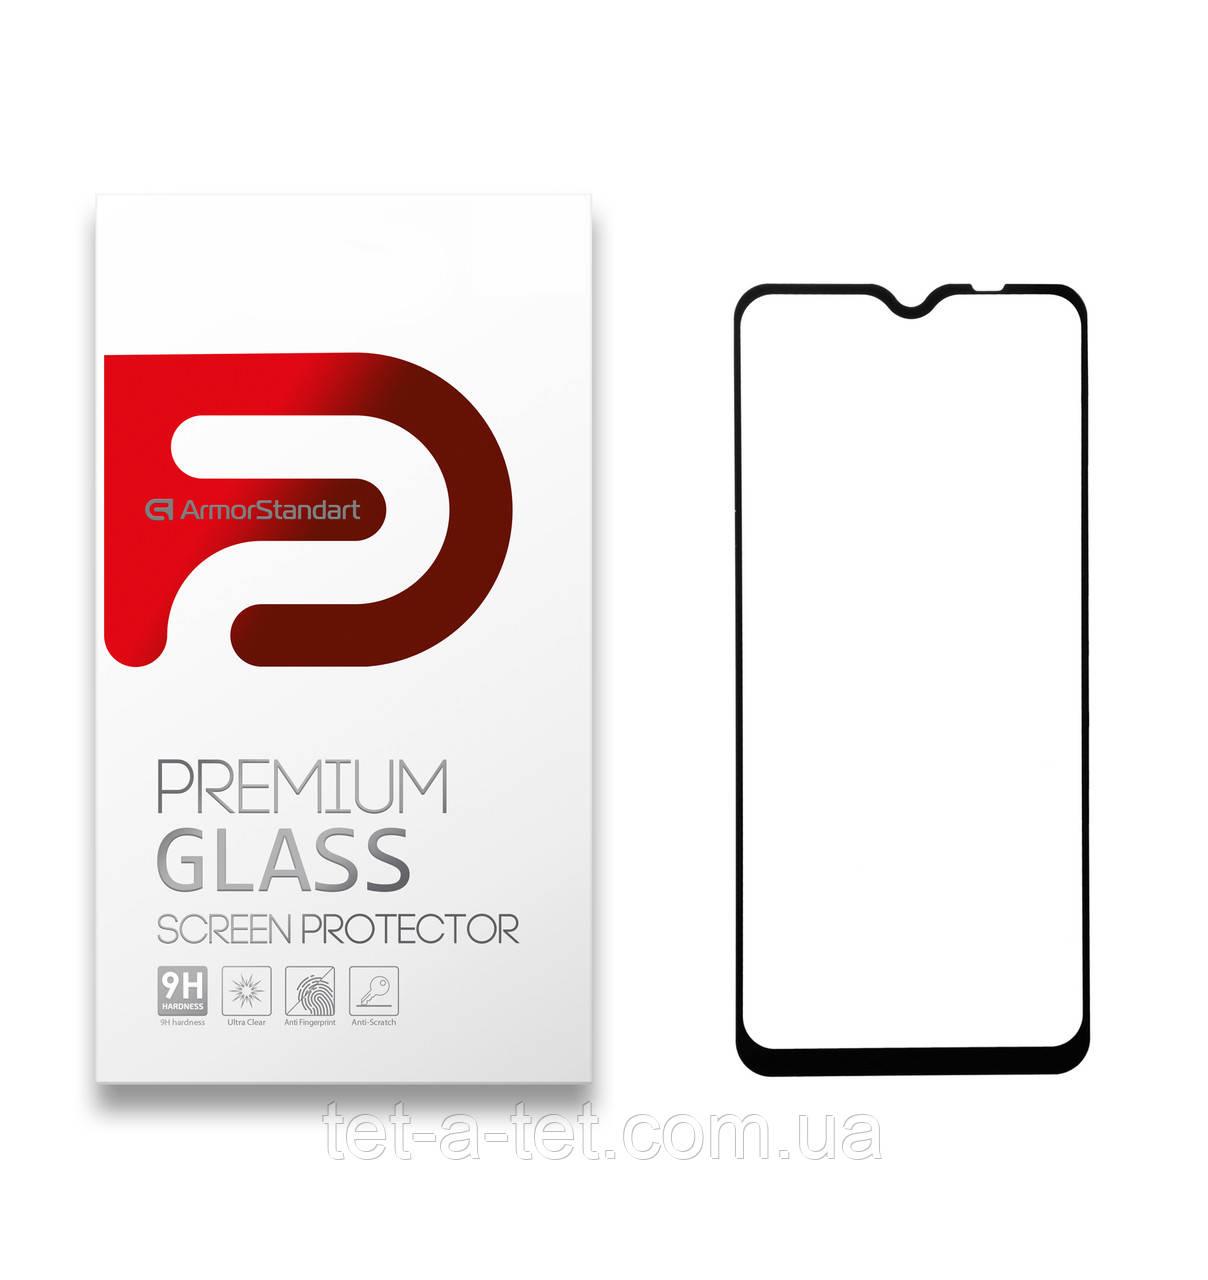 Защитное стекло Armorstandart Full Glue HD для Xiaomi Redmi 9 Black (quality glass)